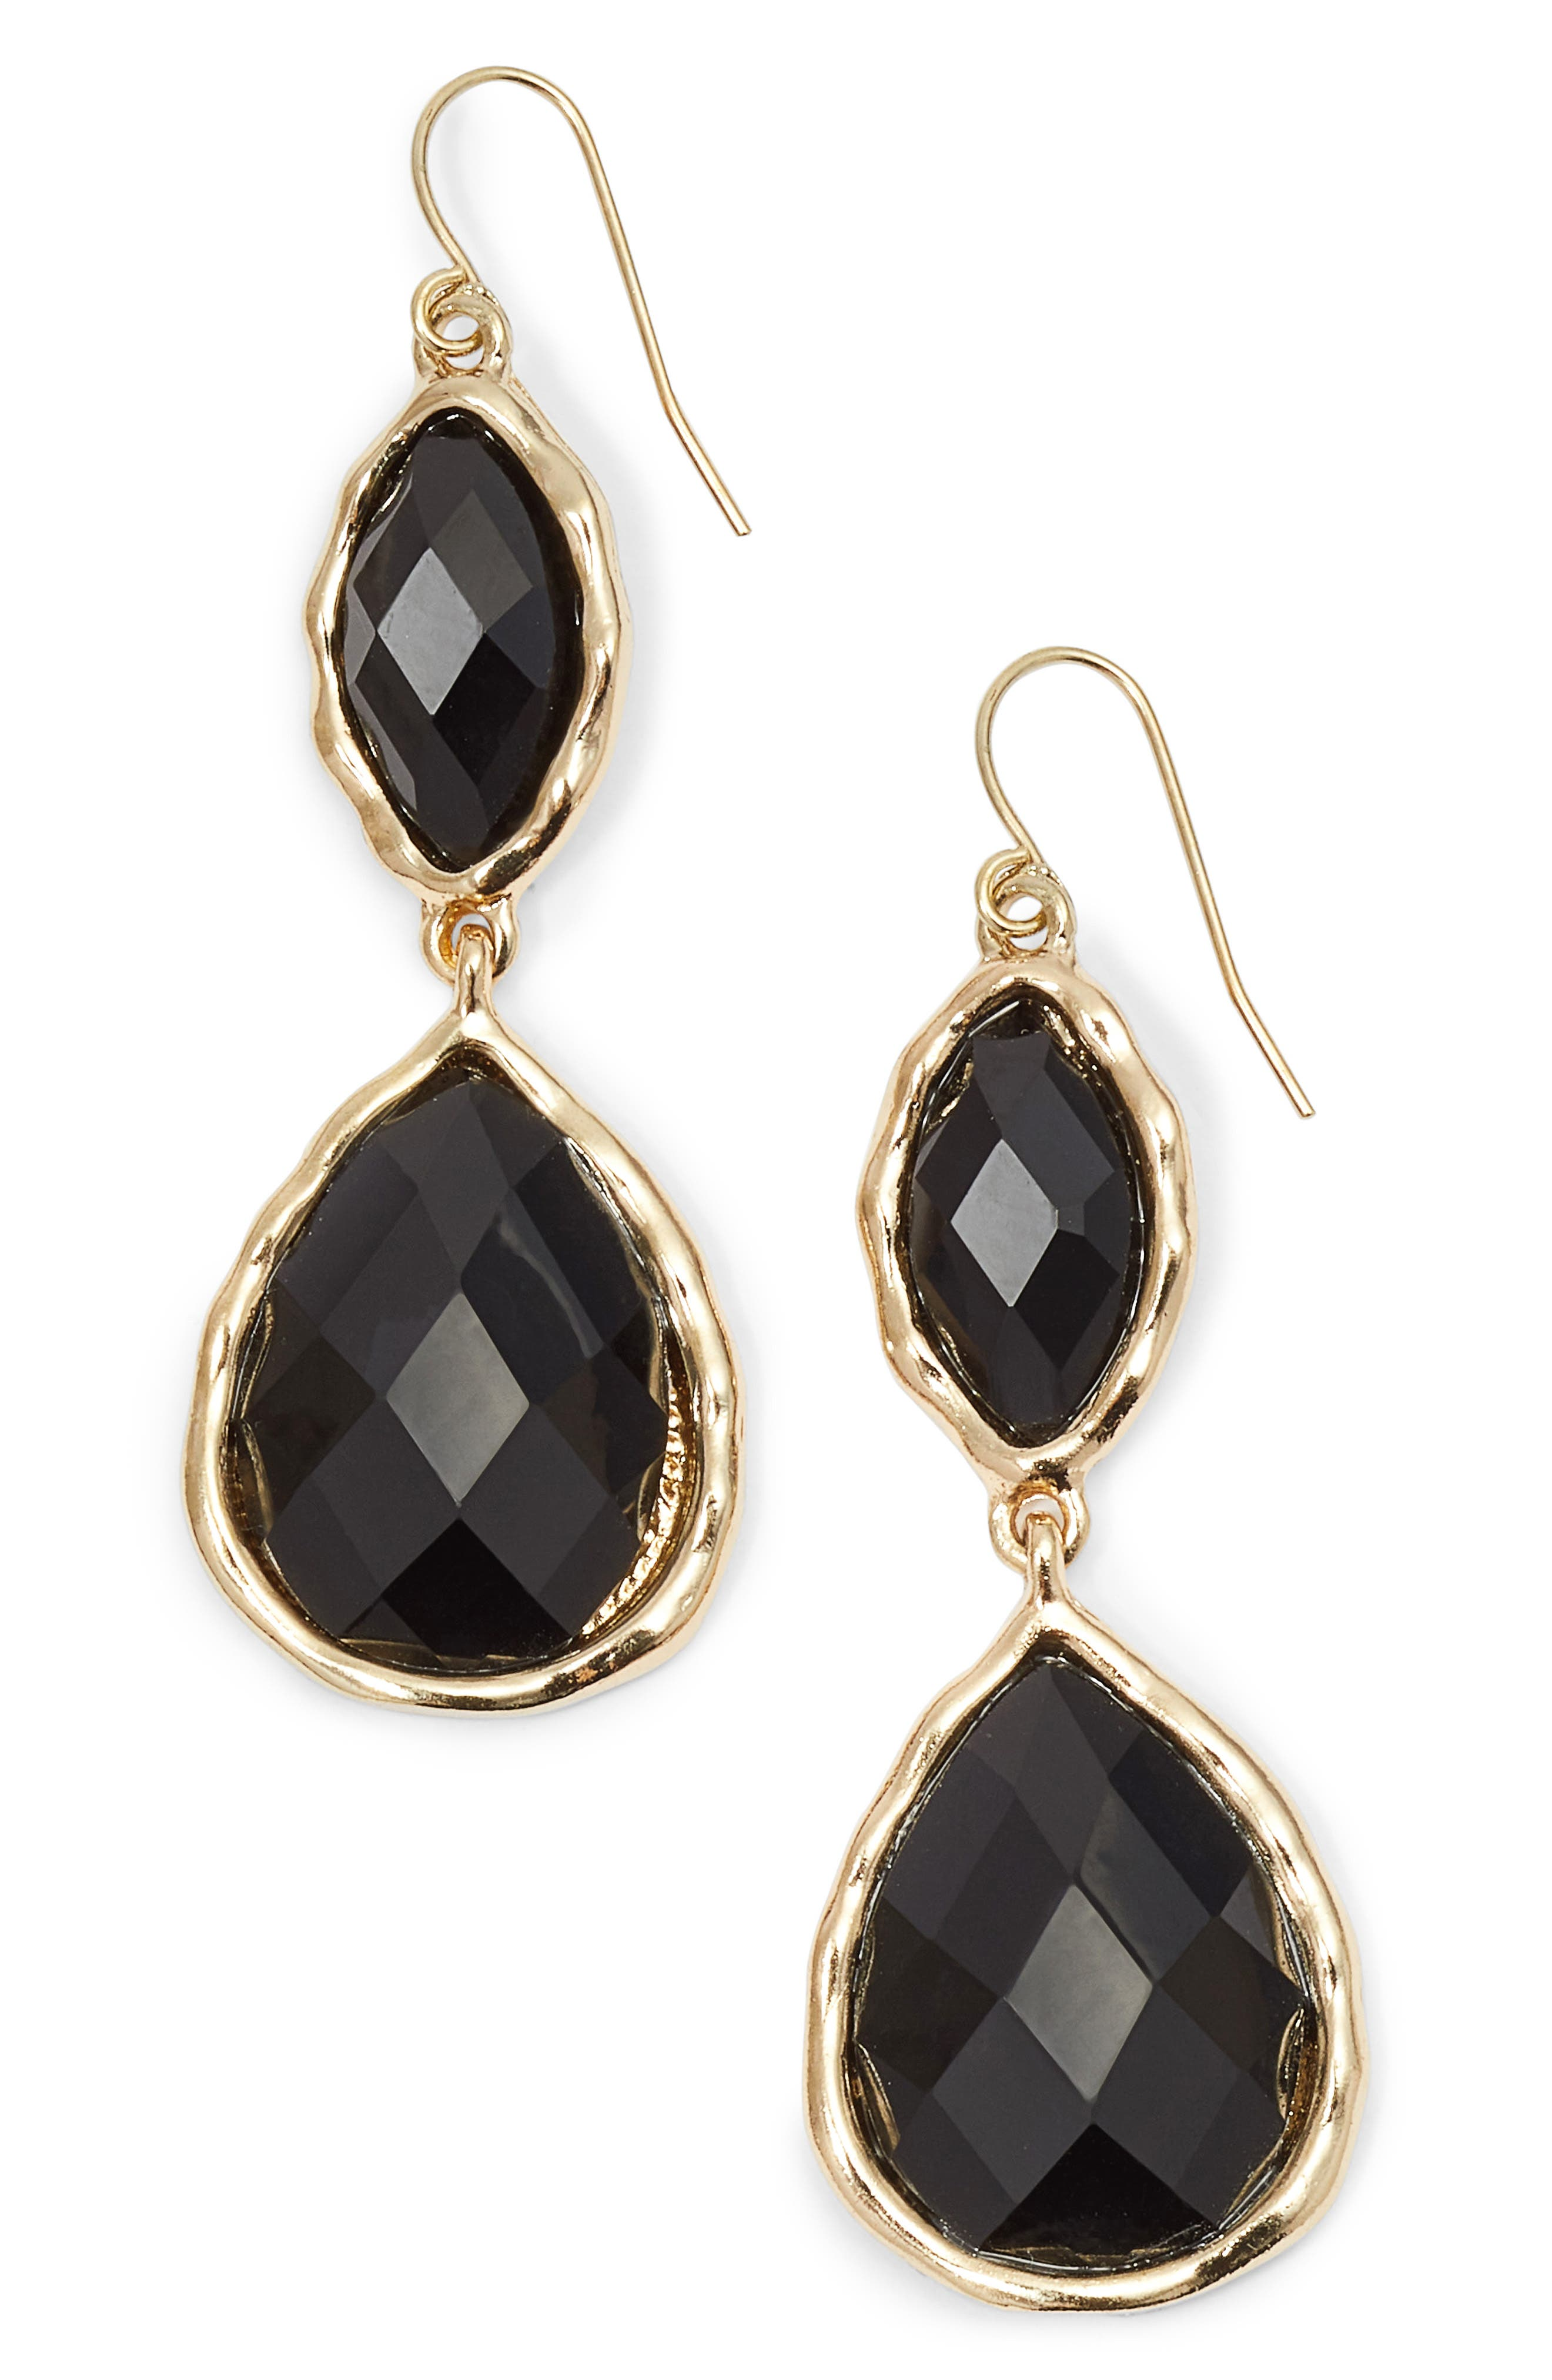 Stone Drop Earrings,                             Main thumbnail 1, color,                             Black